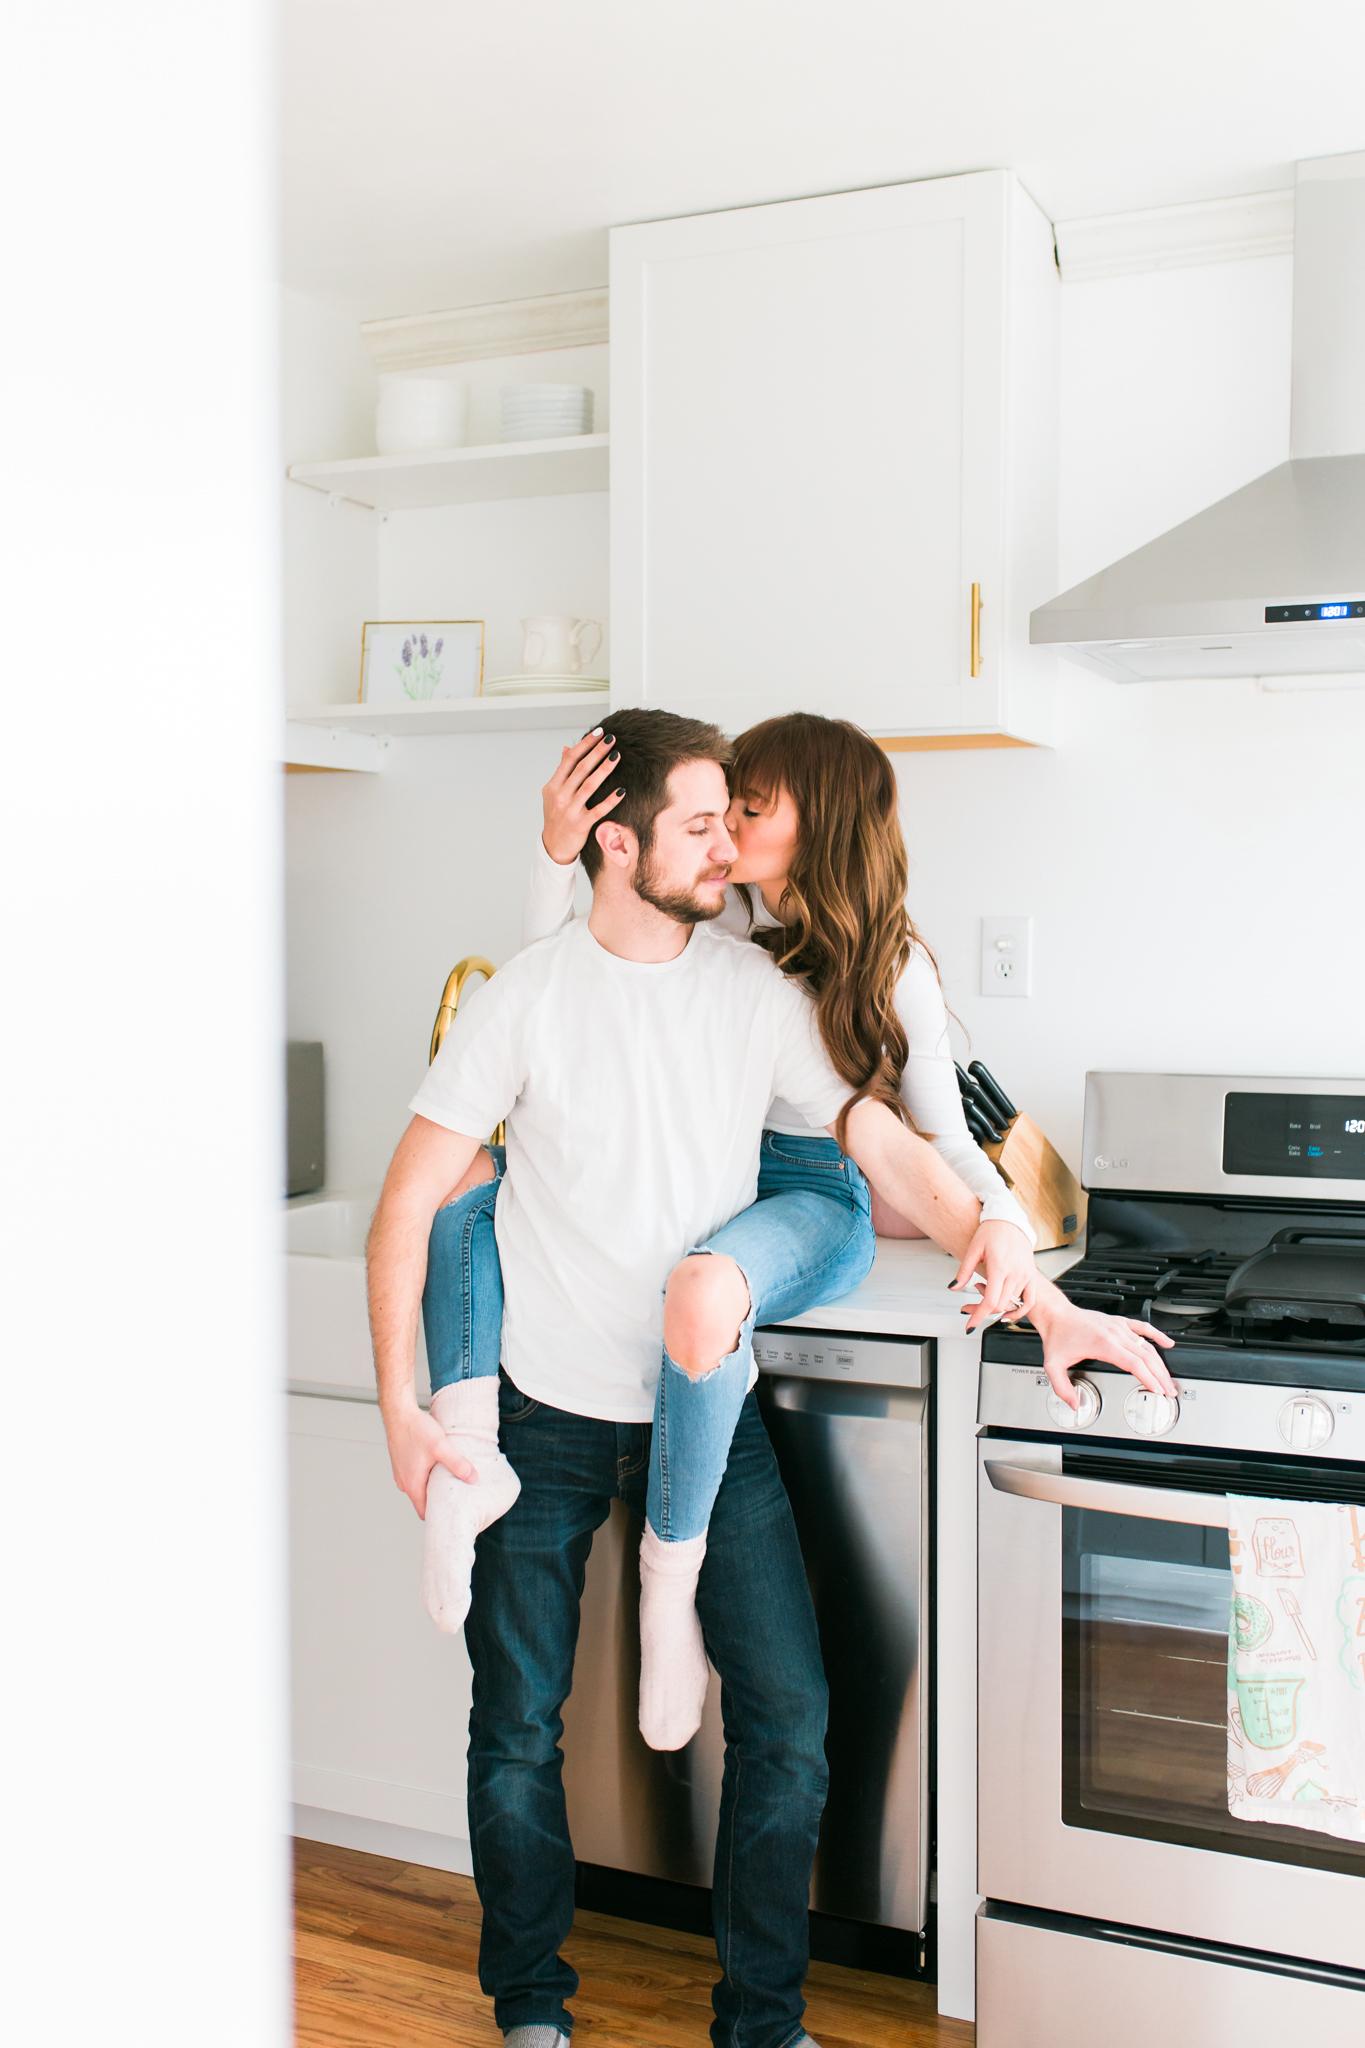 couples-photography-whitney-bufton-photography-utah-45.jpg